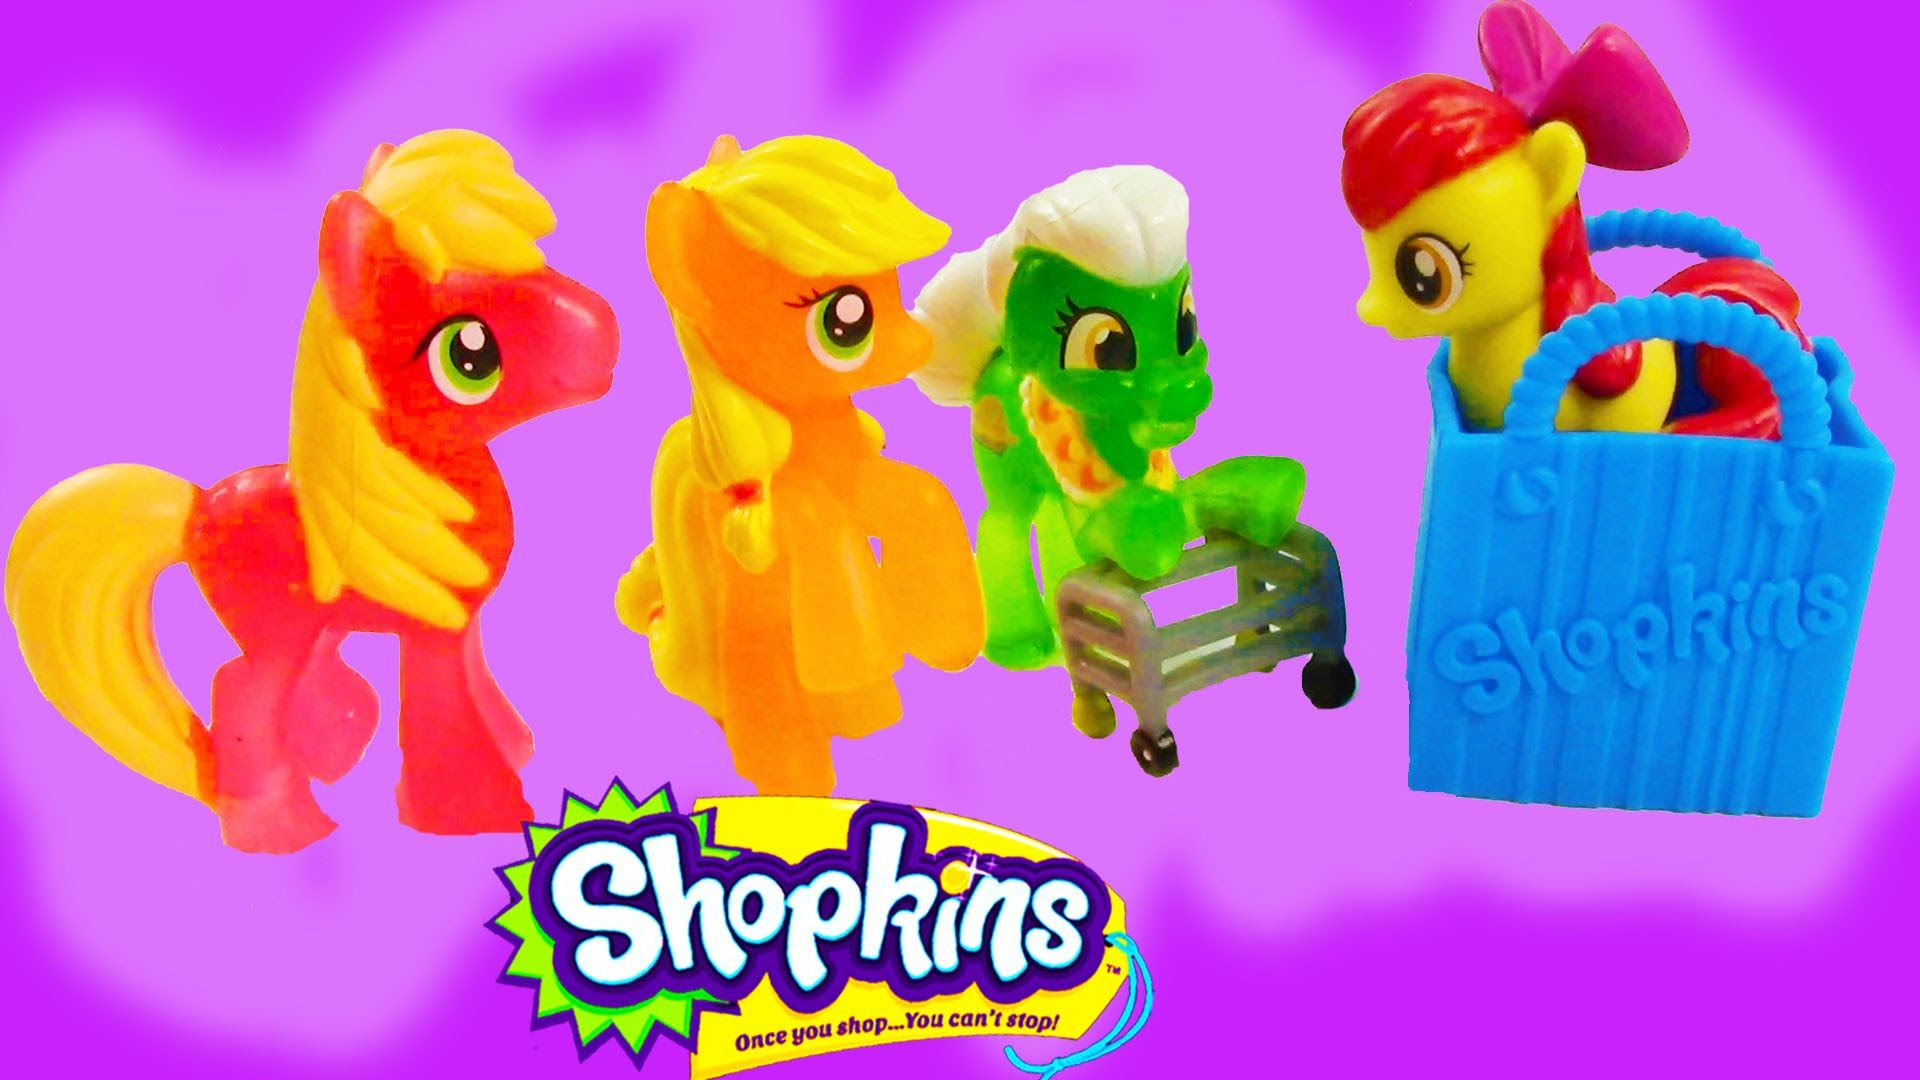 Mlp Shopkins 12 Pack Mystery Surprise Blind Bag My Little